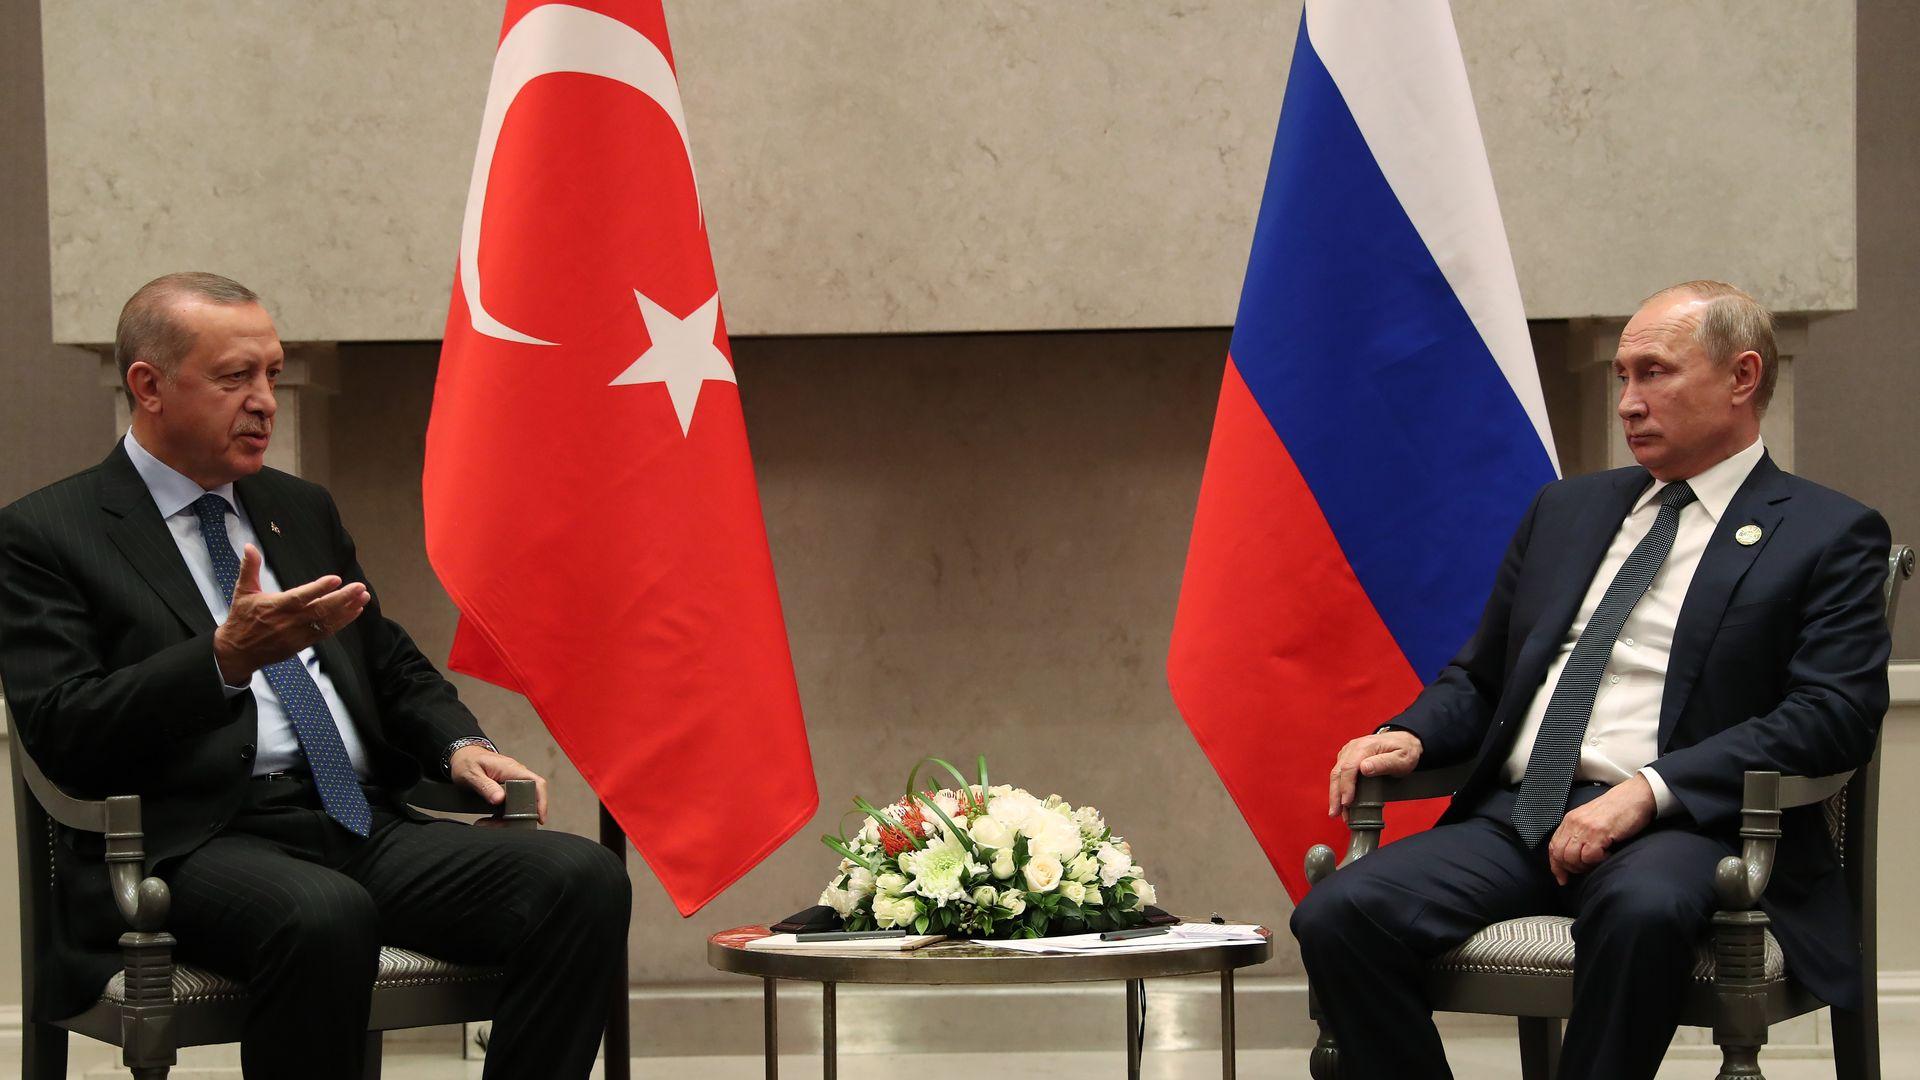 Turkish President Recep Tayyip Erdogan meets Russian President Vladimir Putin.